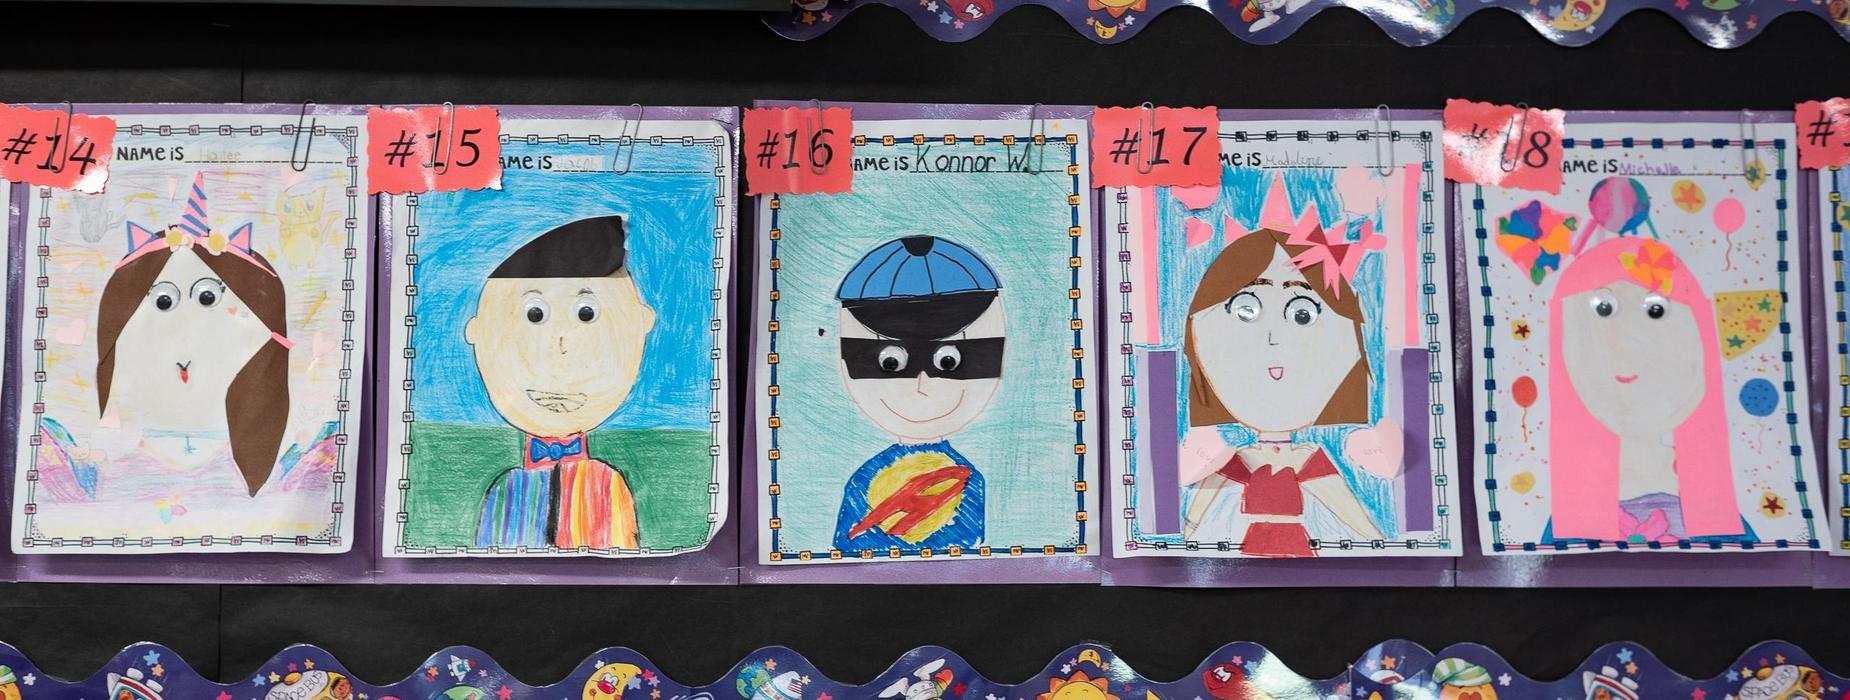 Baldwin Student Self Art Project